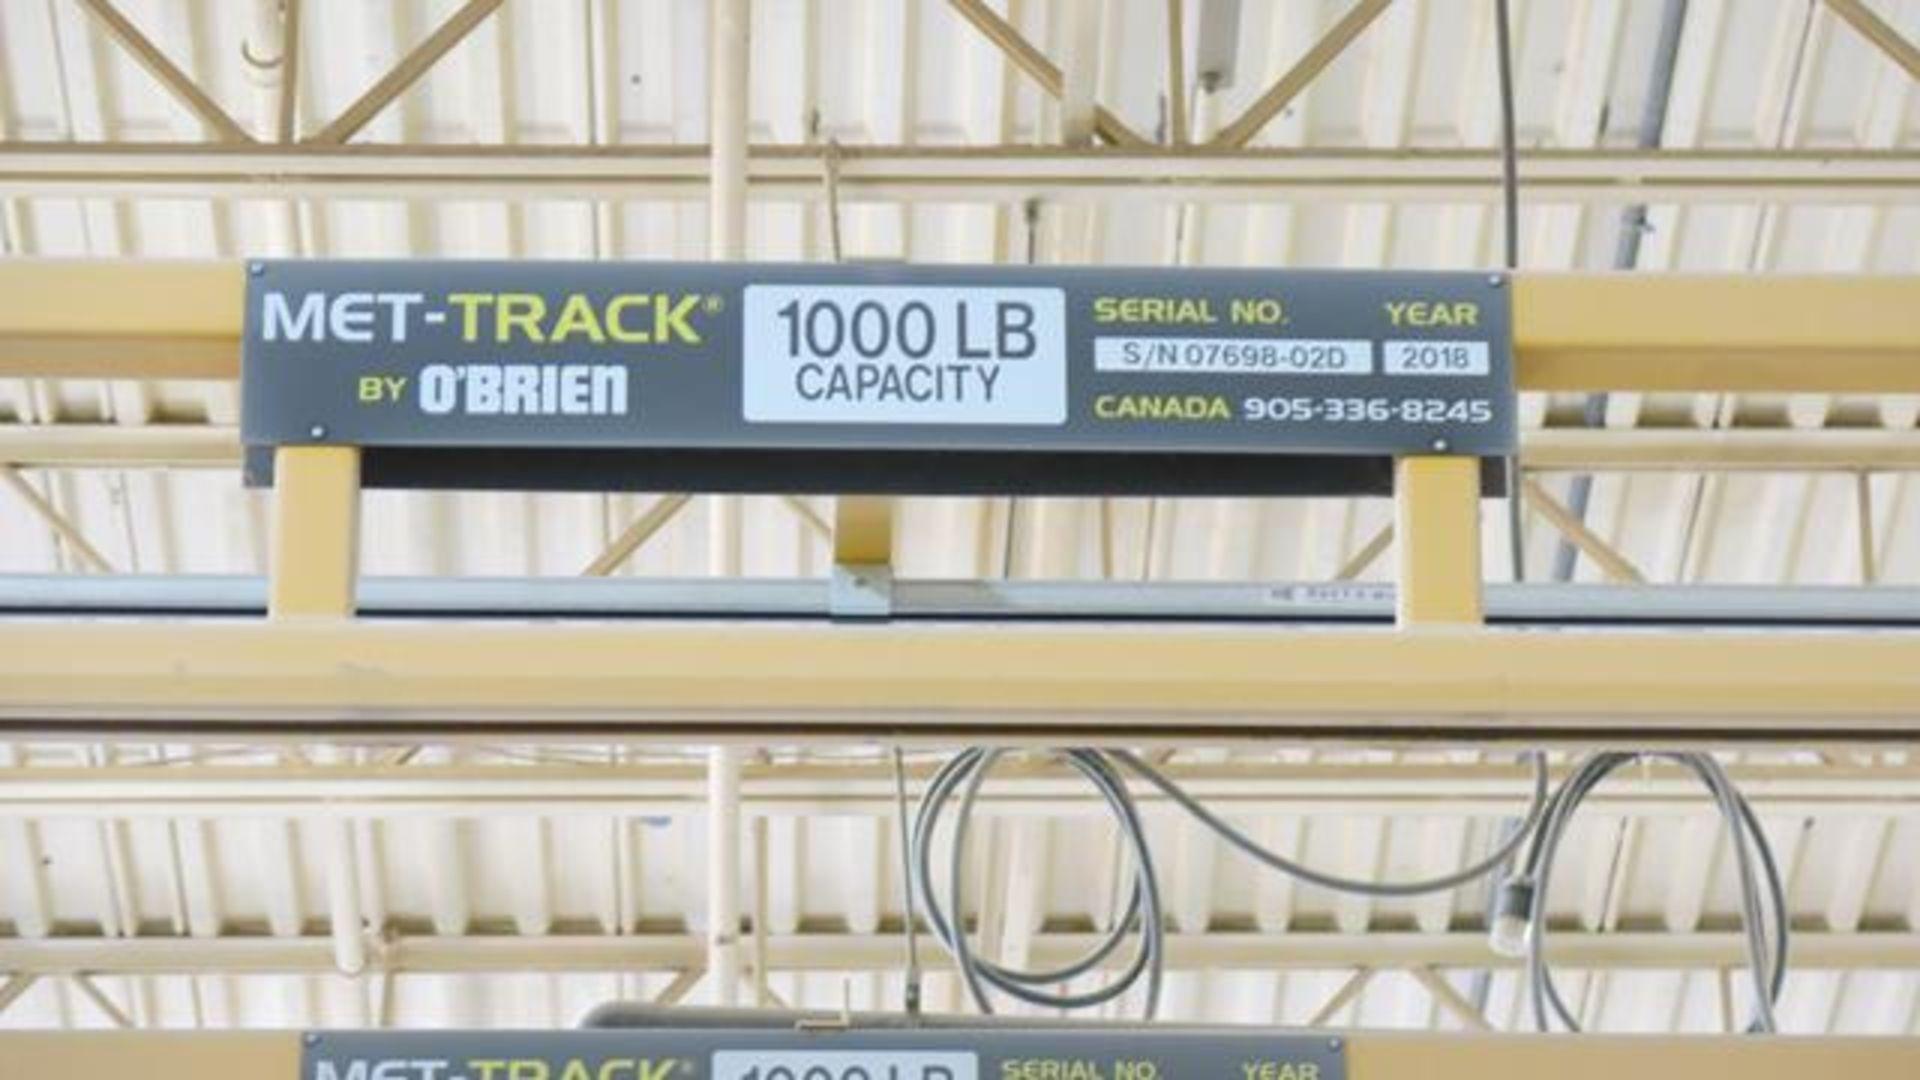 Lot 923 - O'BRIEN, MET TRACK FREE STANDING, FOUR STATION, WORKSTATION BRIDGE CRANE